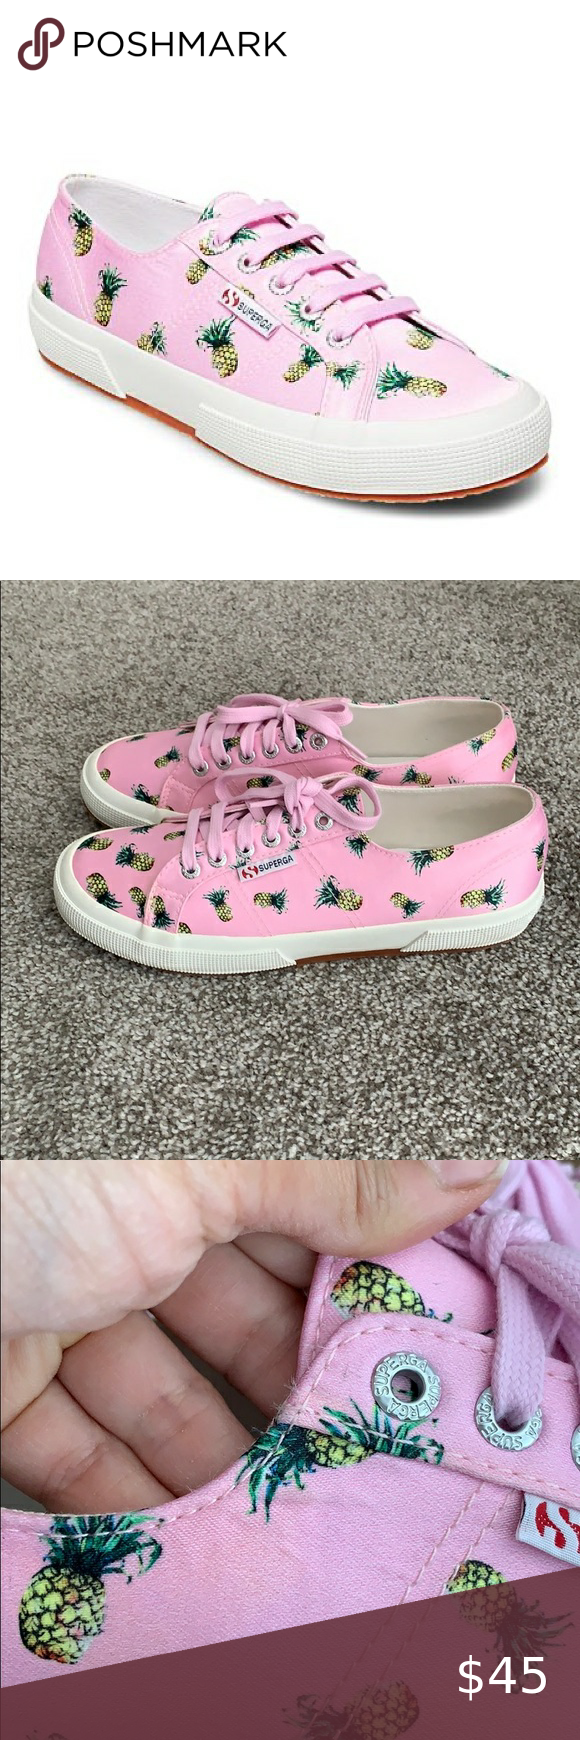 SUPERGA Pink Pineapple Sneakers Sz 40